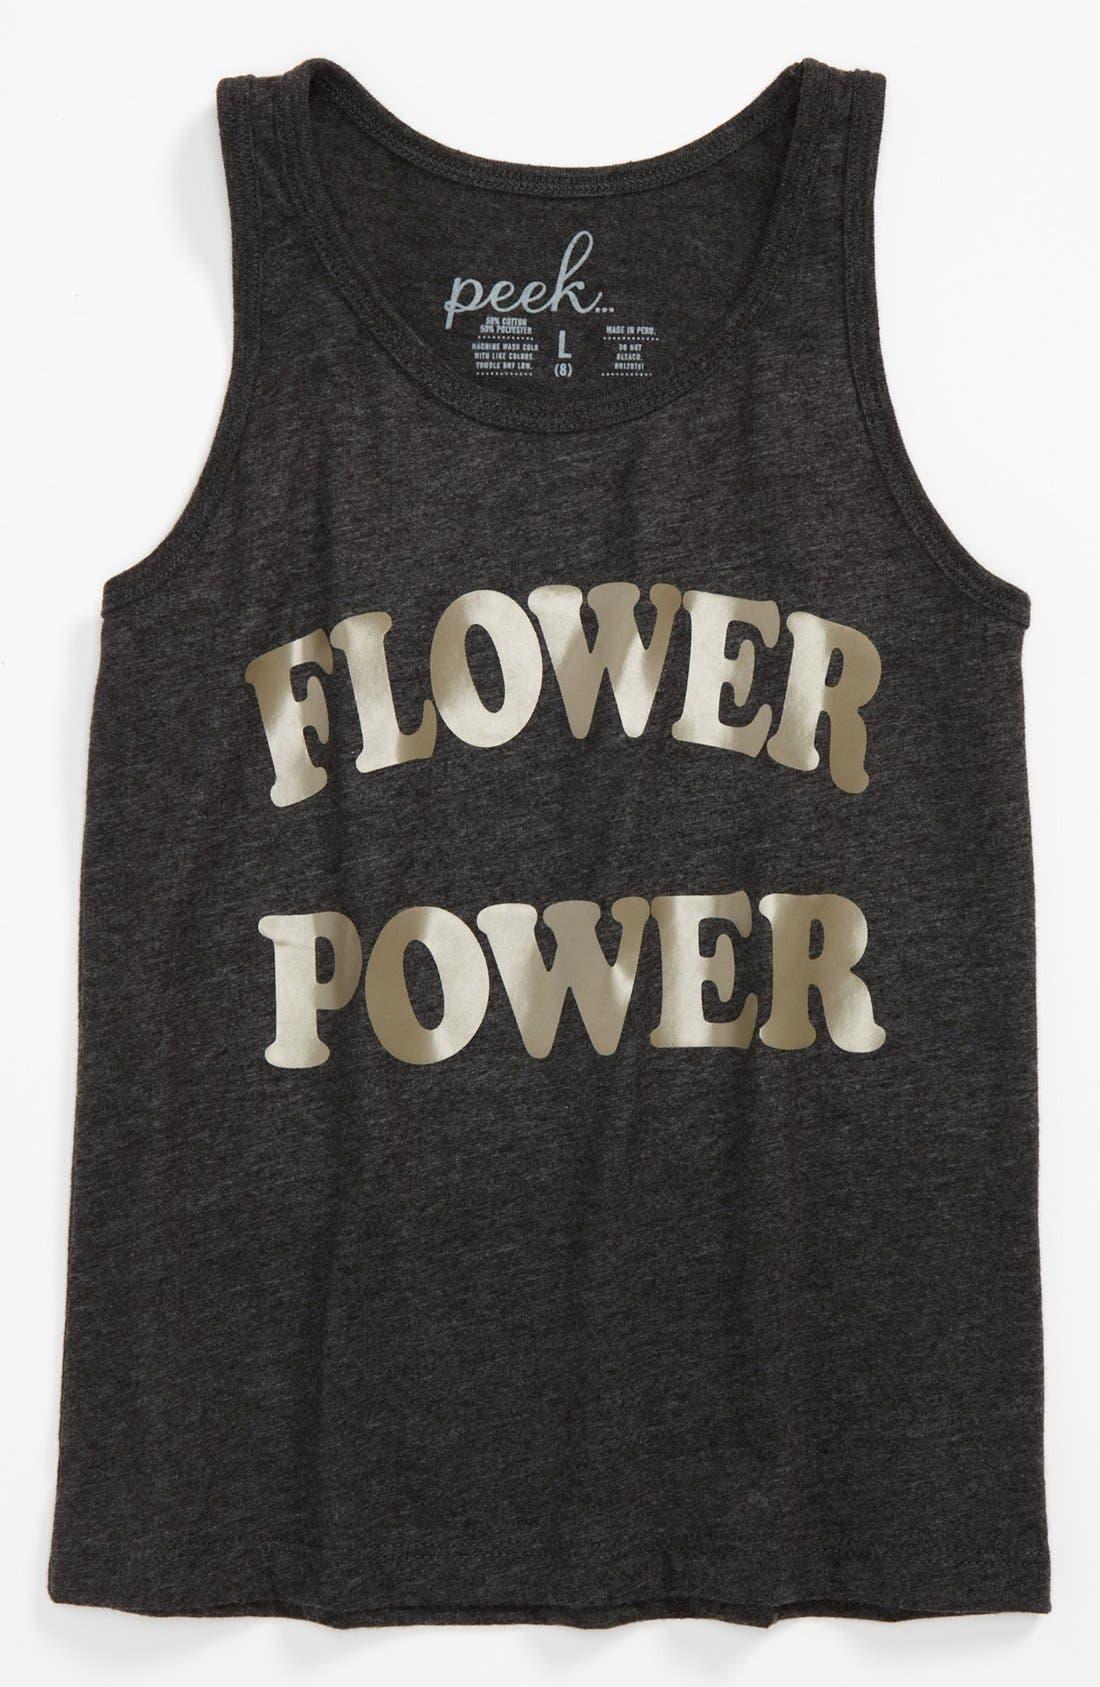 Alternate Image 1 Selected - Peek 'Flower Power' Tank Top (Toddler, Little Girls & Big Girls)